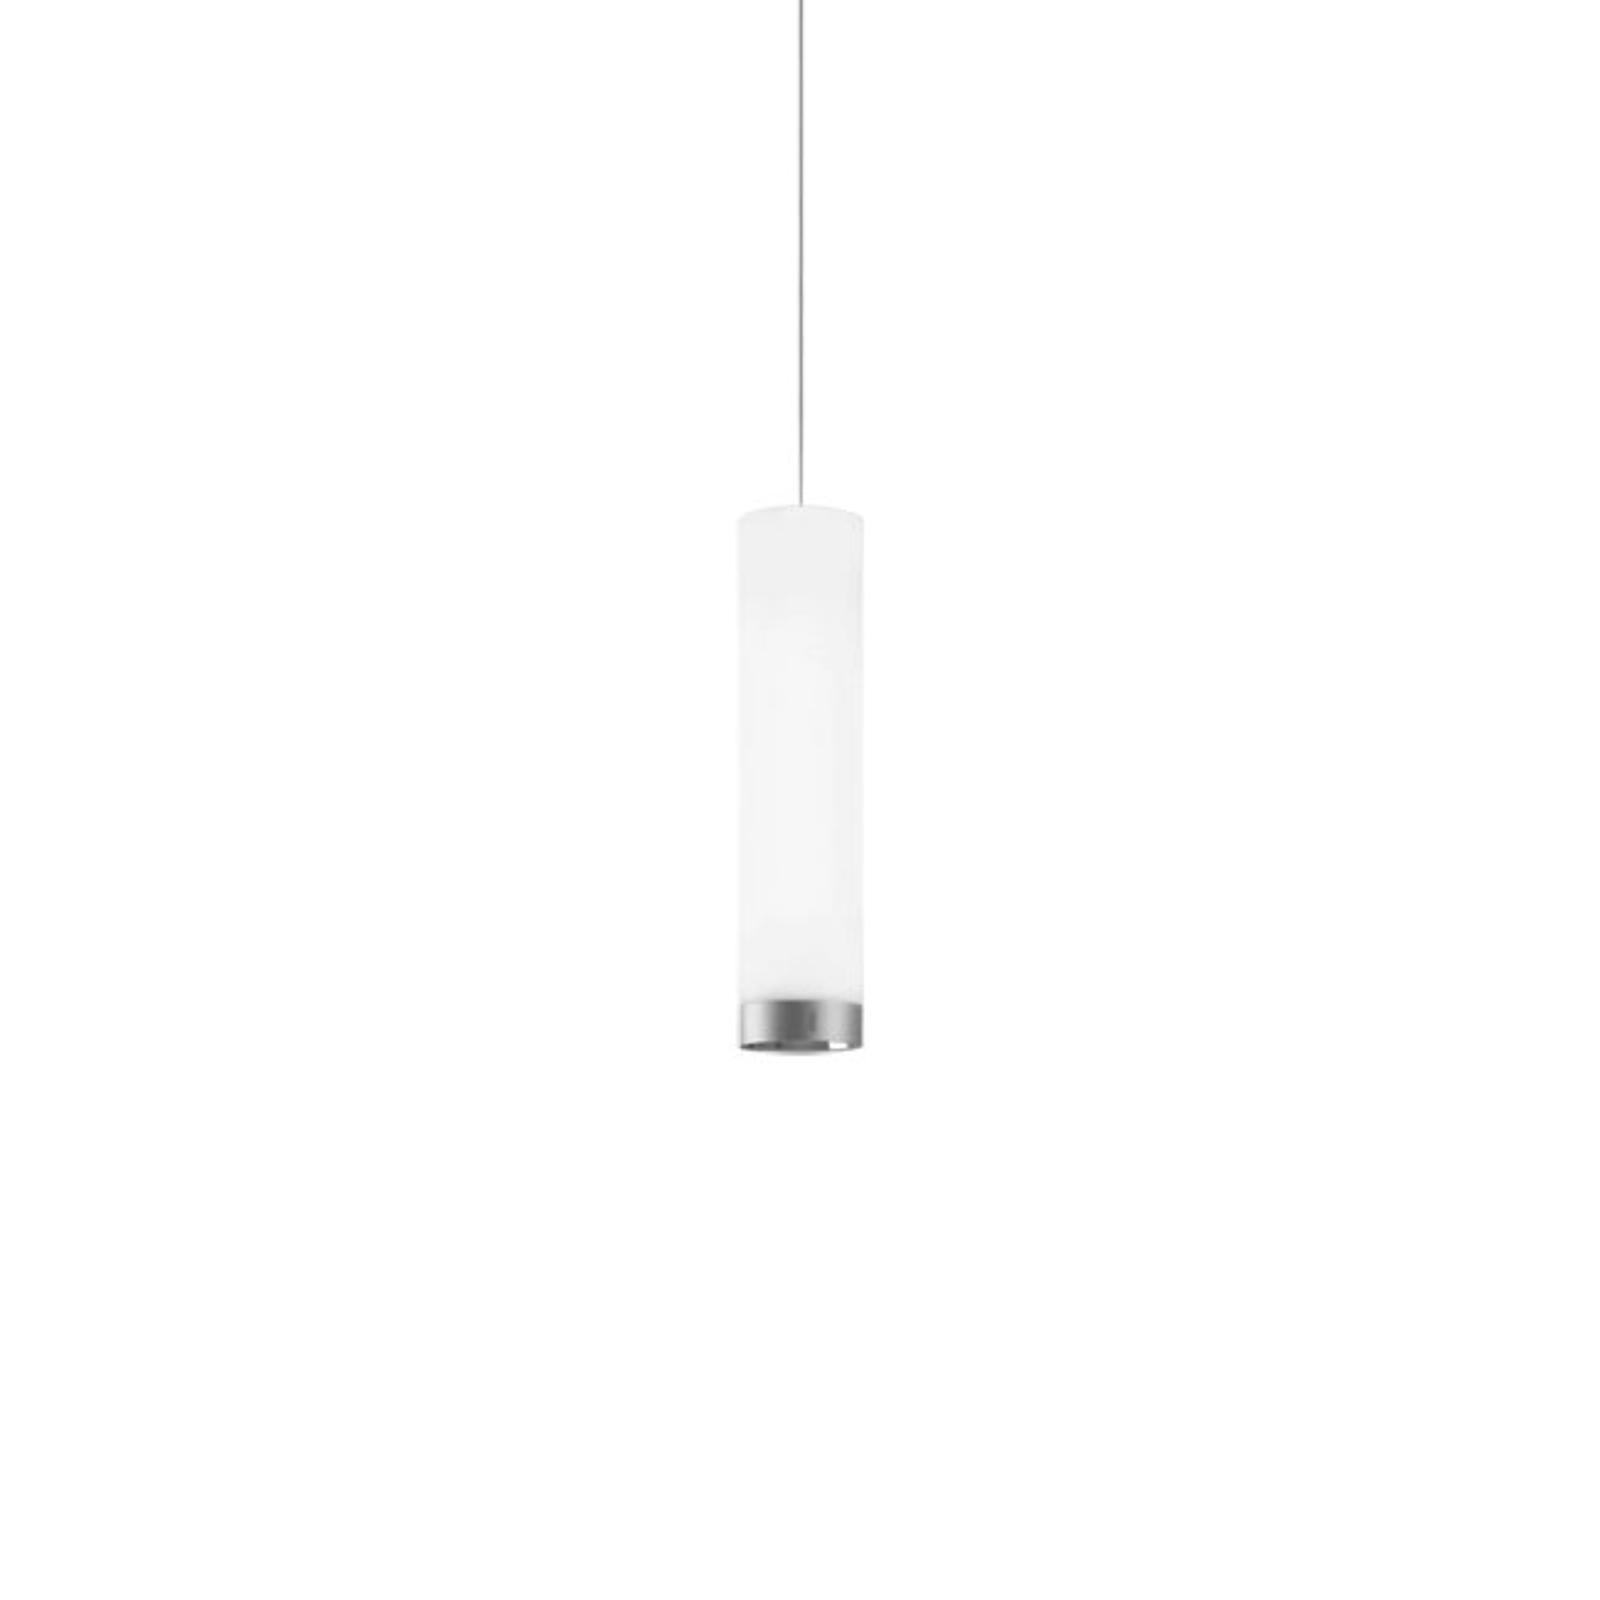 LED hanglamp A20-P166, 67,5 cm, 29W, 4.000K